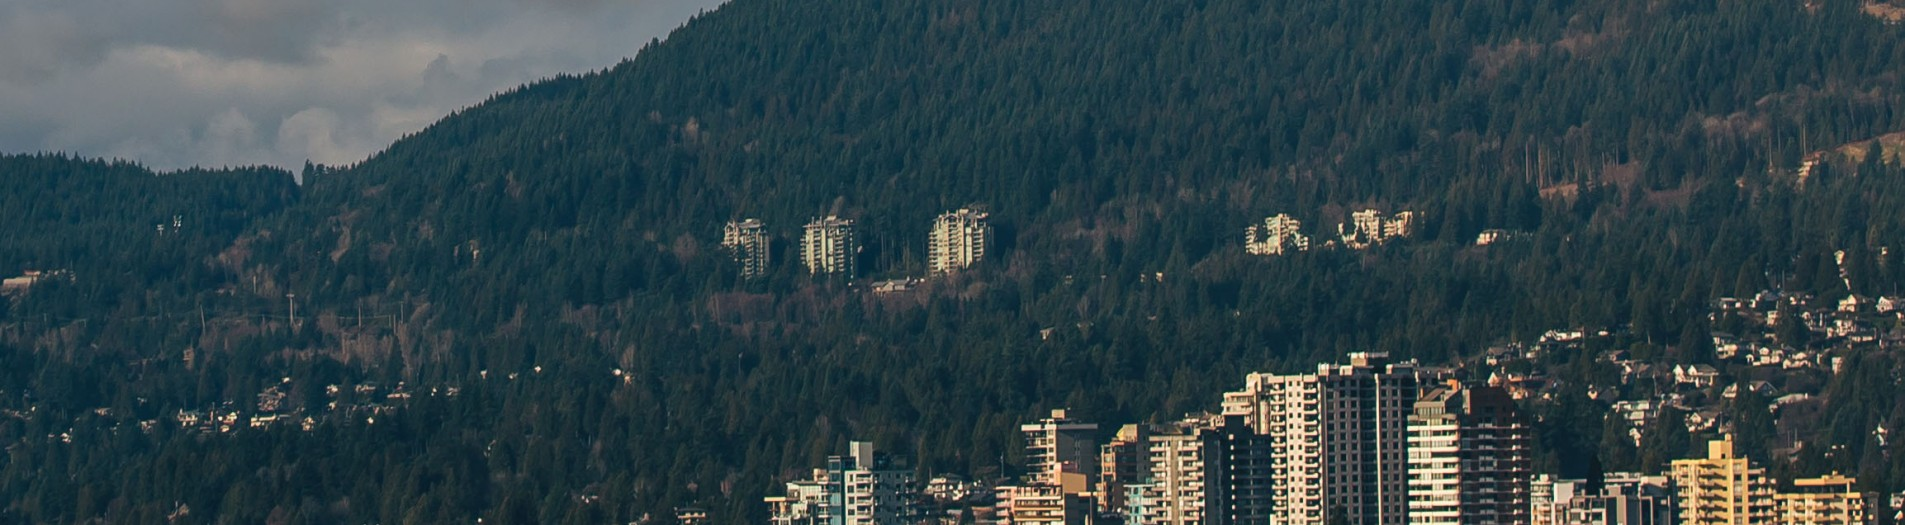 Wandering Through Vancouver, British Columbia